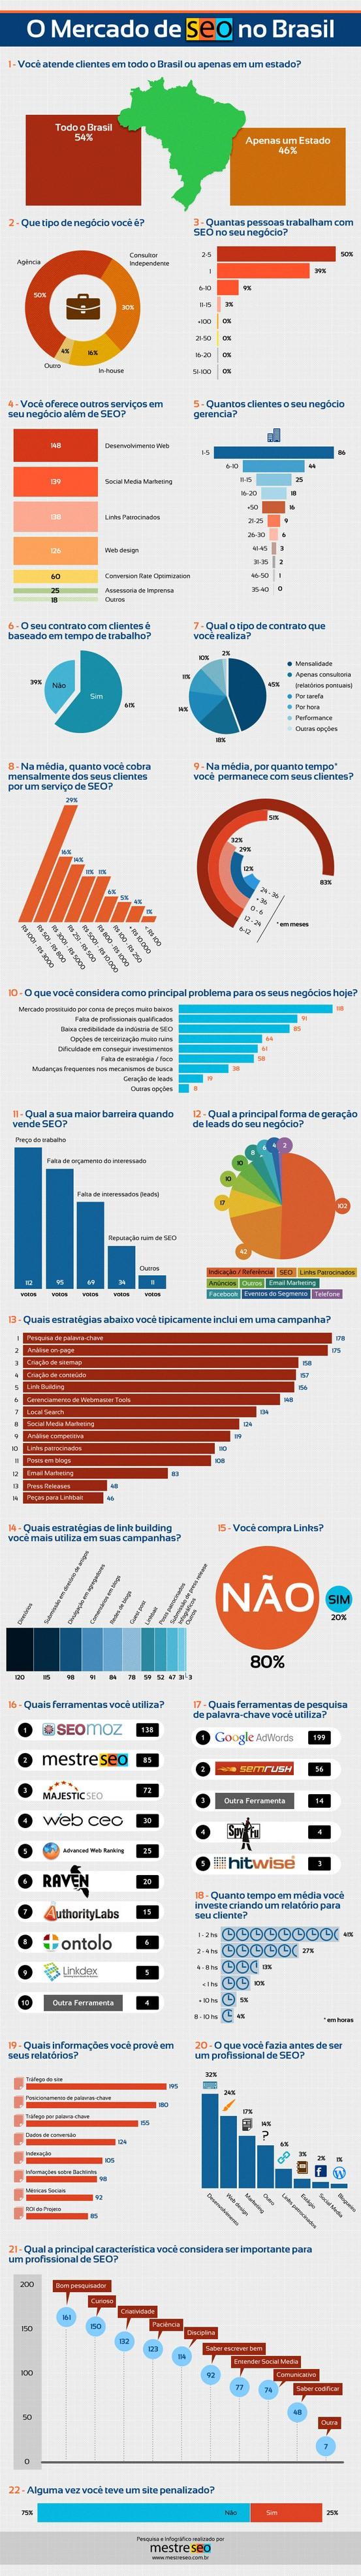 O Mercado De Seo No Brasil Web Strategy Marketing Social Media Digital Marketing